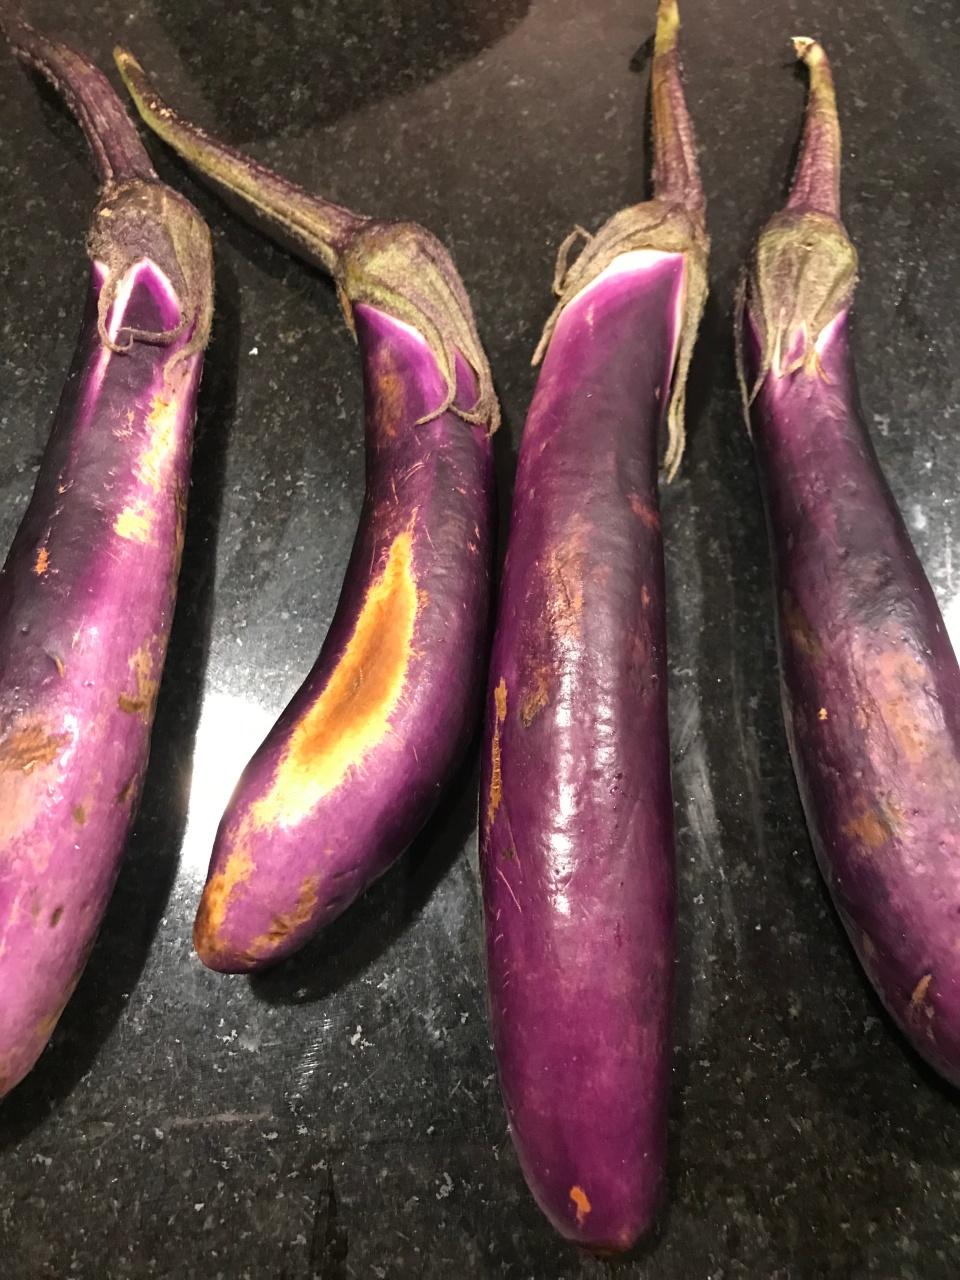 Eleven_Madison_Park_Aged_Beef_Japanese_Eggplants